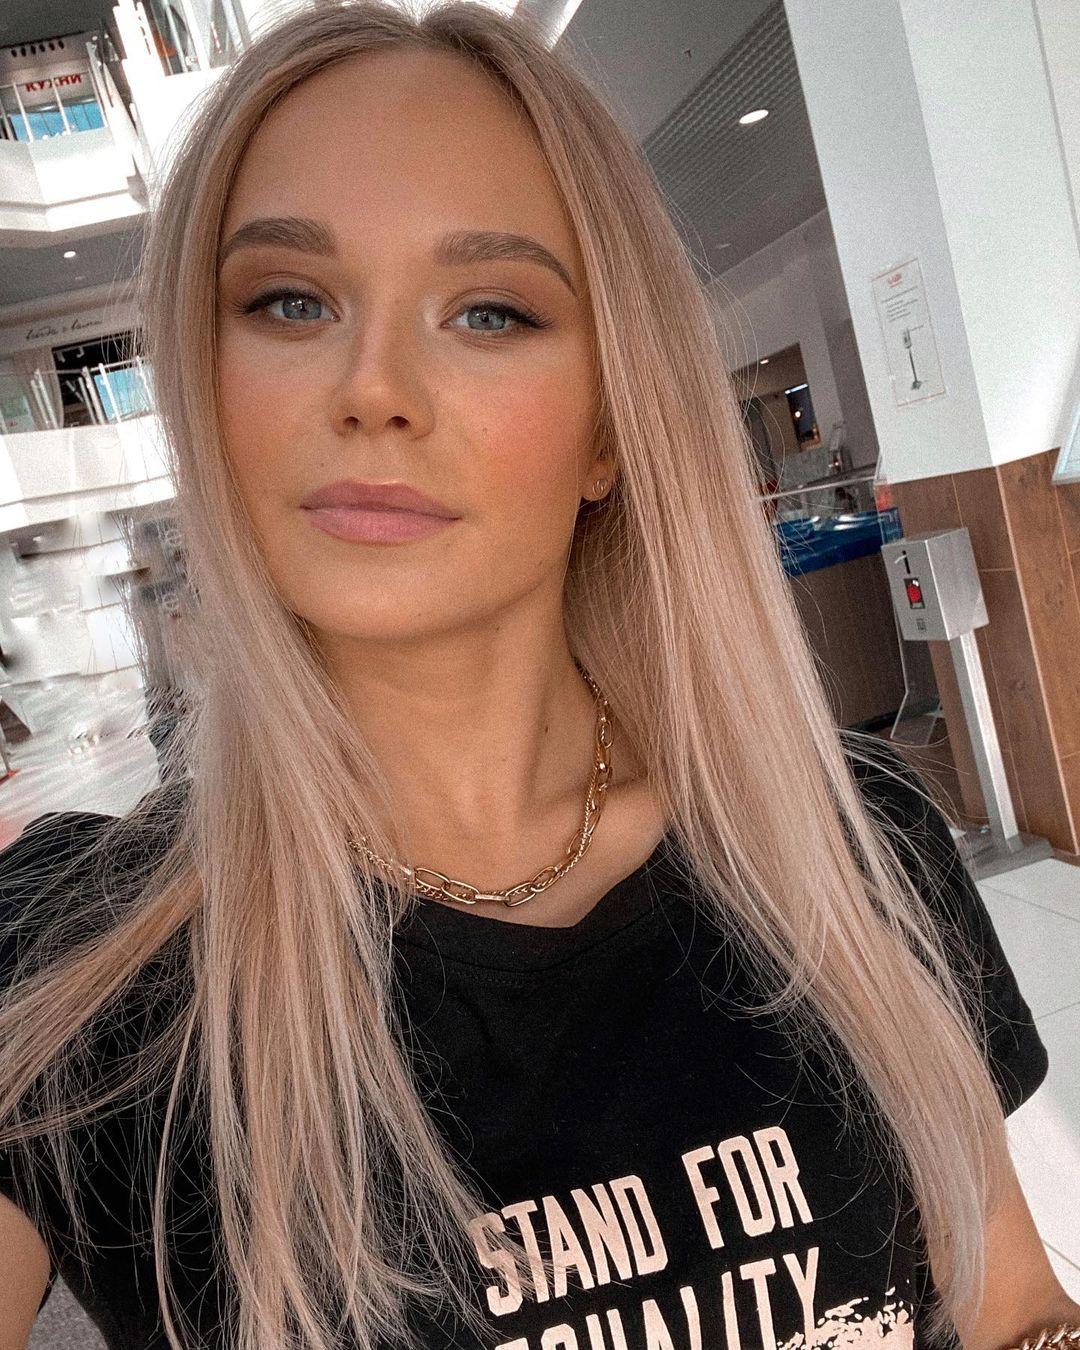 Angelina-Melnikova-Wallpapers-Insta-Fit-Bio-9